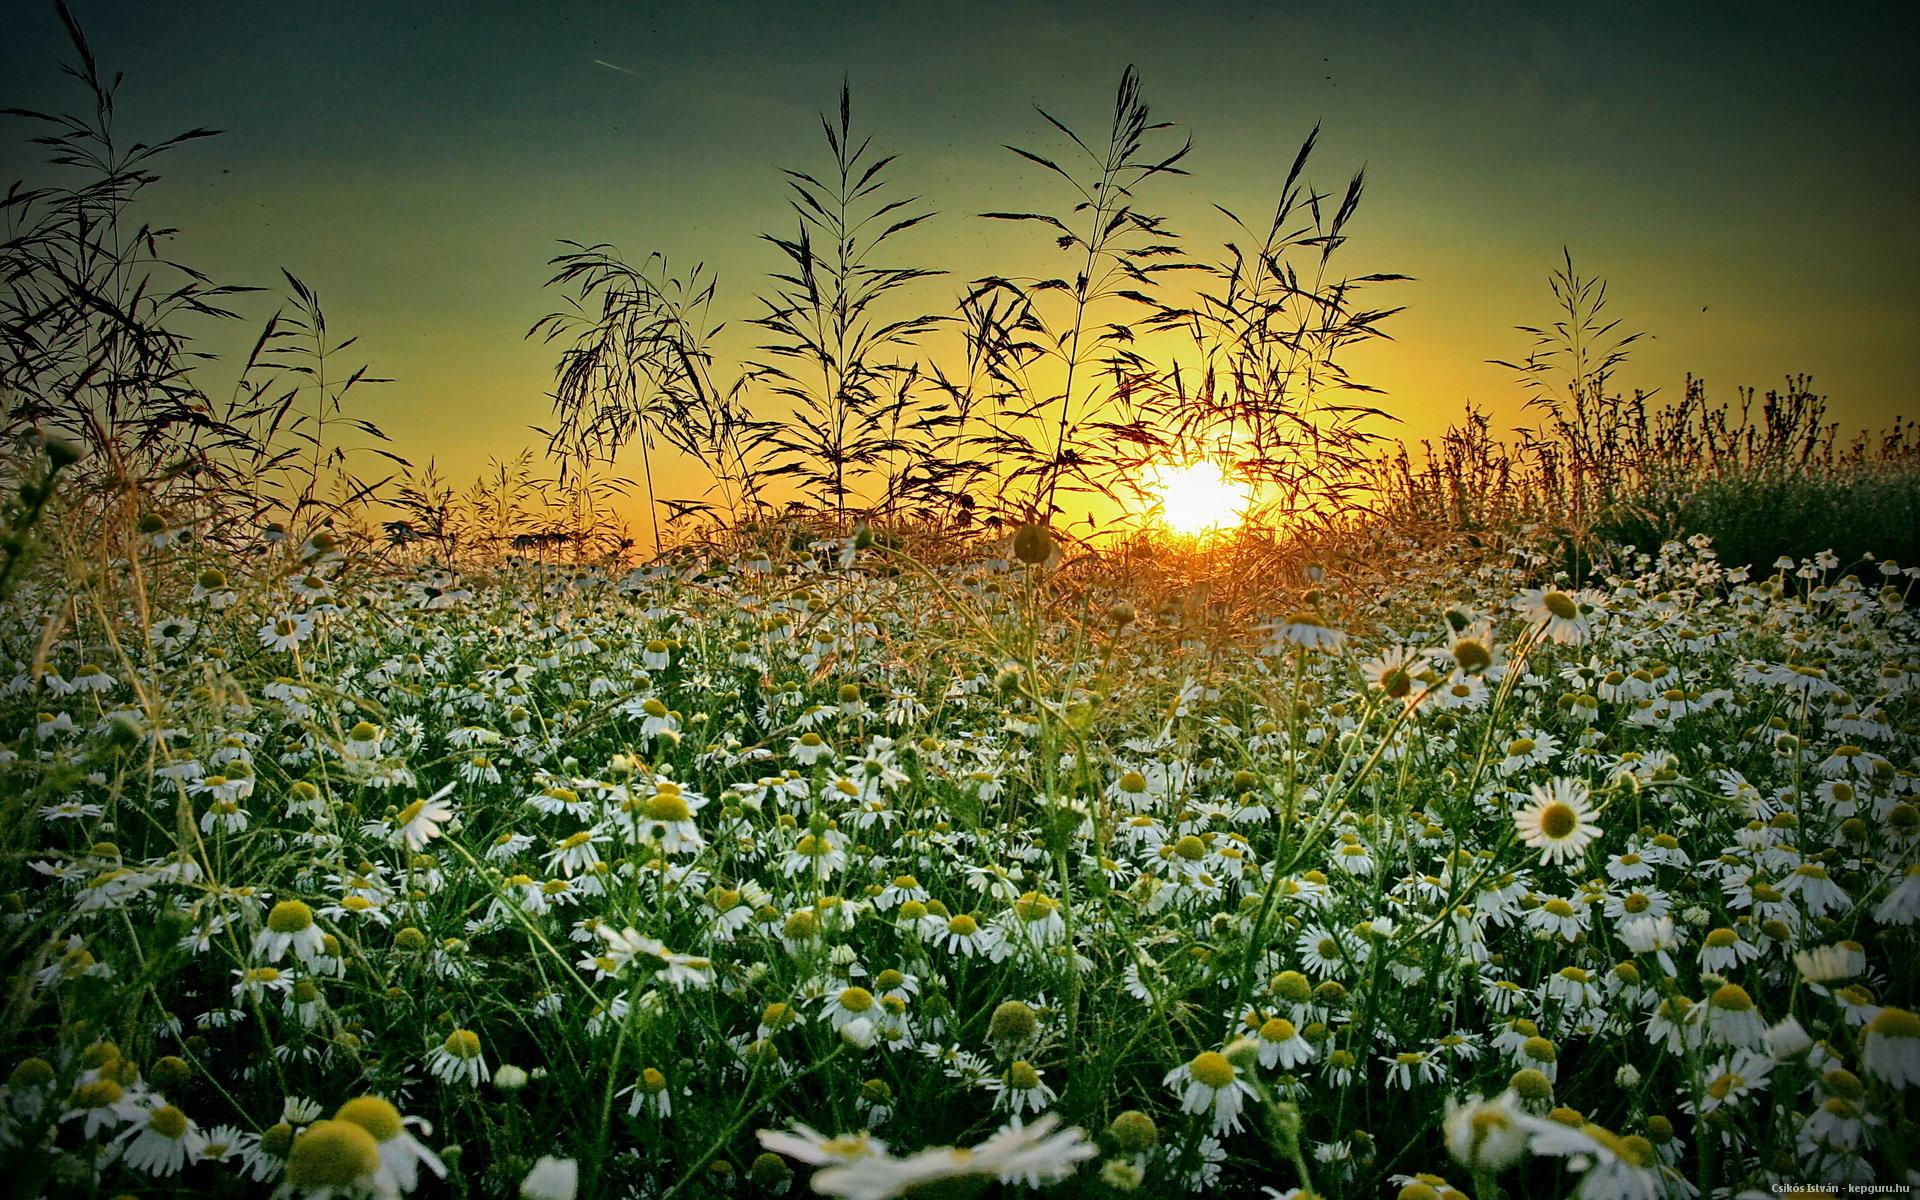 Summer Flower Field Wallpaper Summer Wildflowers Wal...